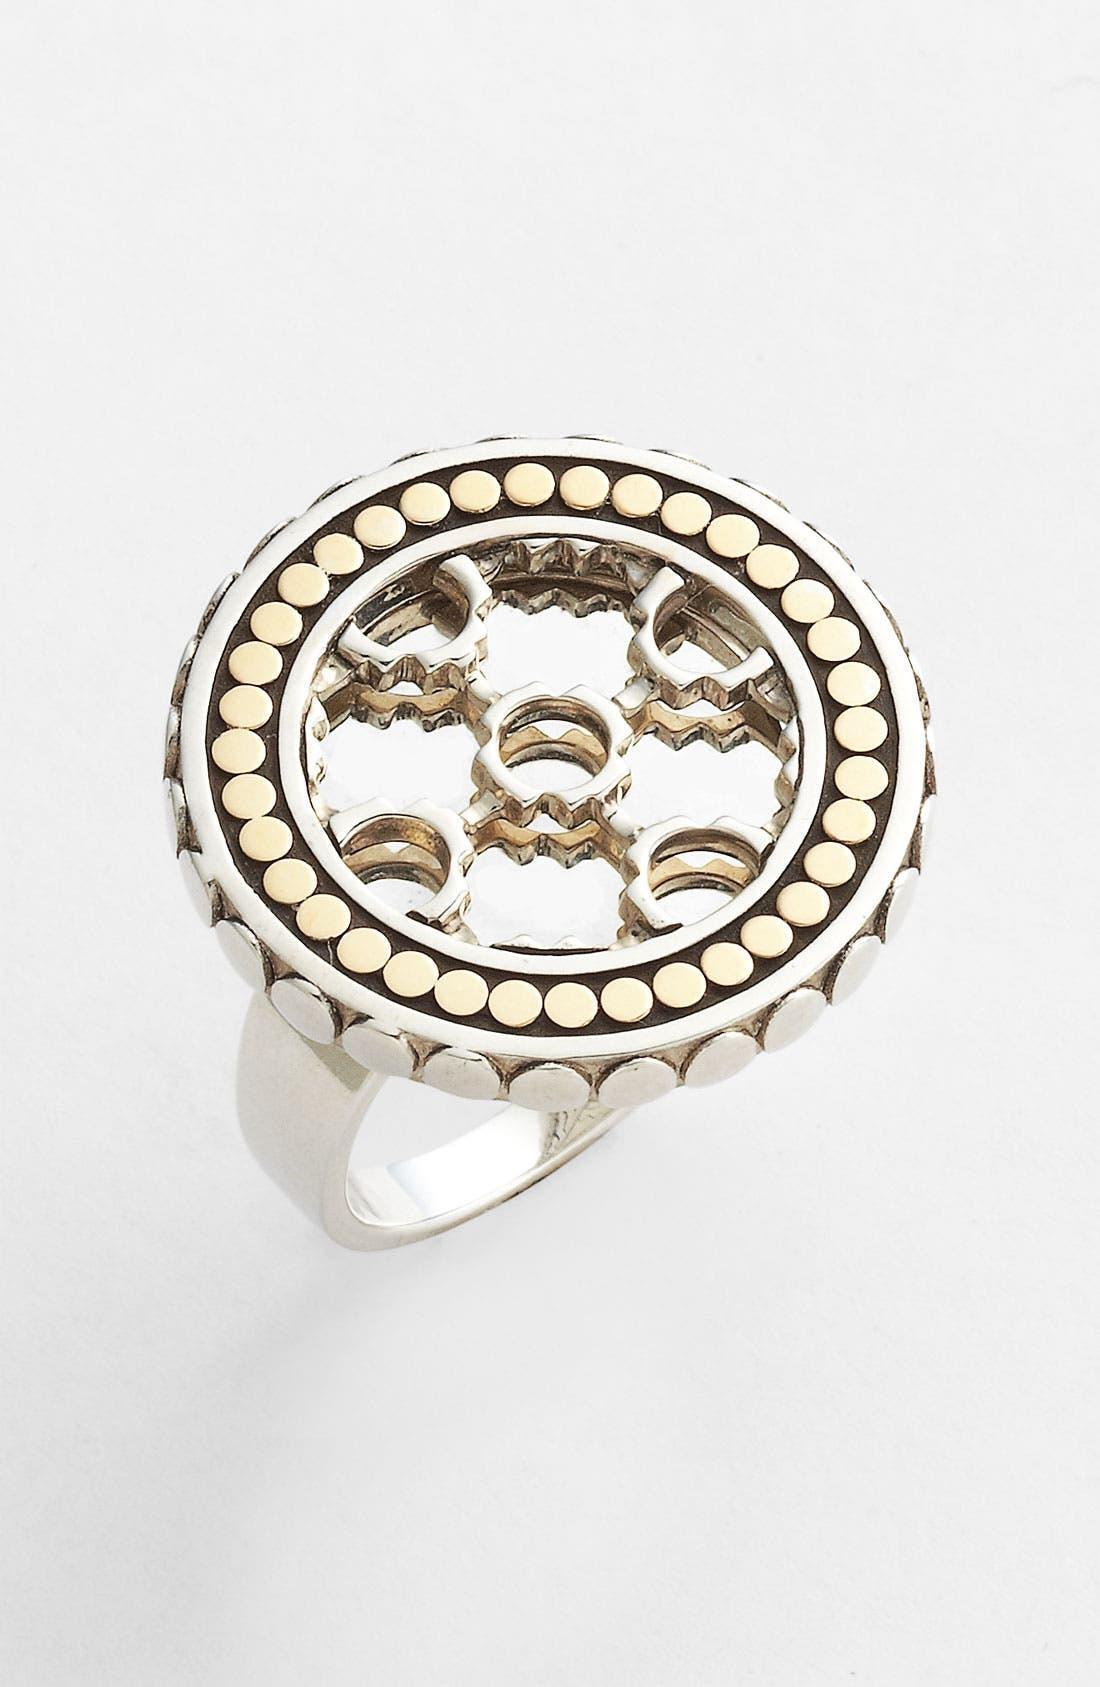 Alternate Image 1 Selected - John Hardy 'Dot' Coin Ring